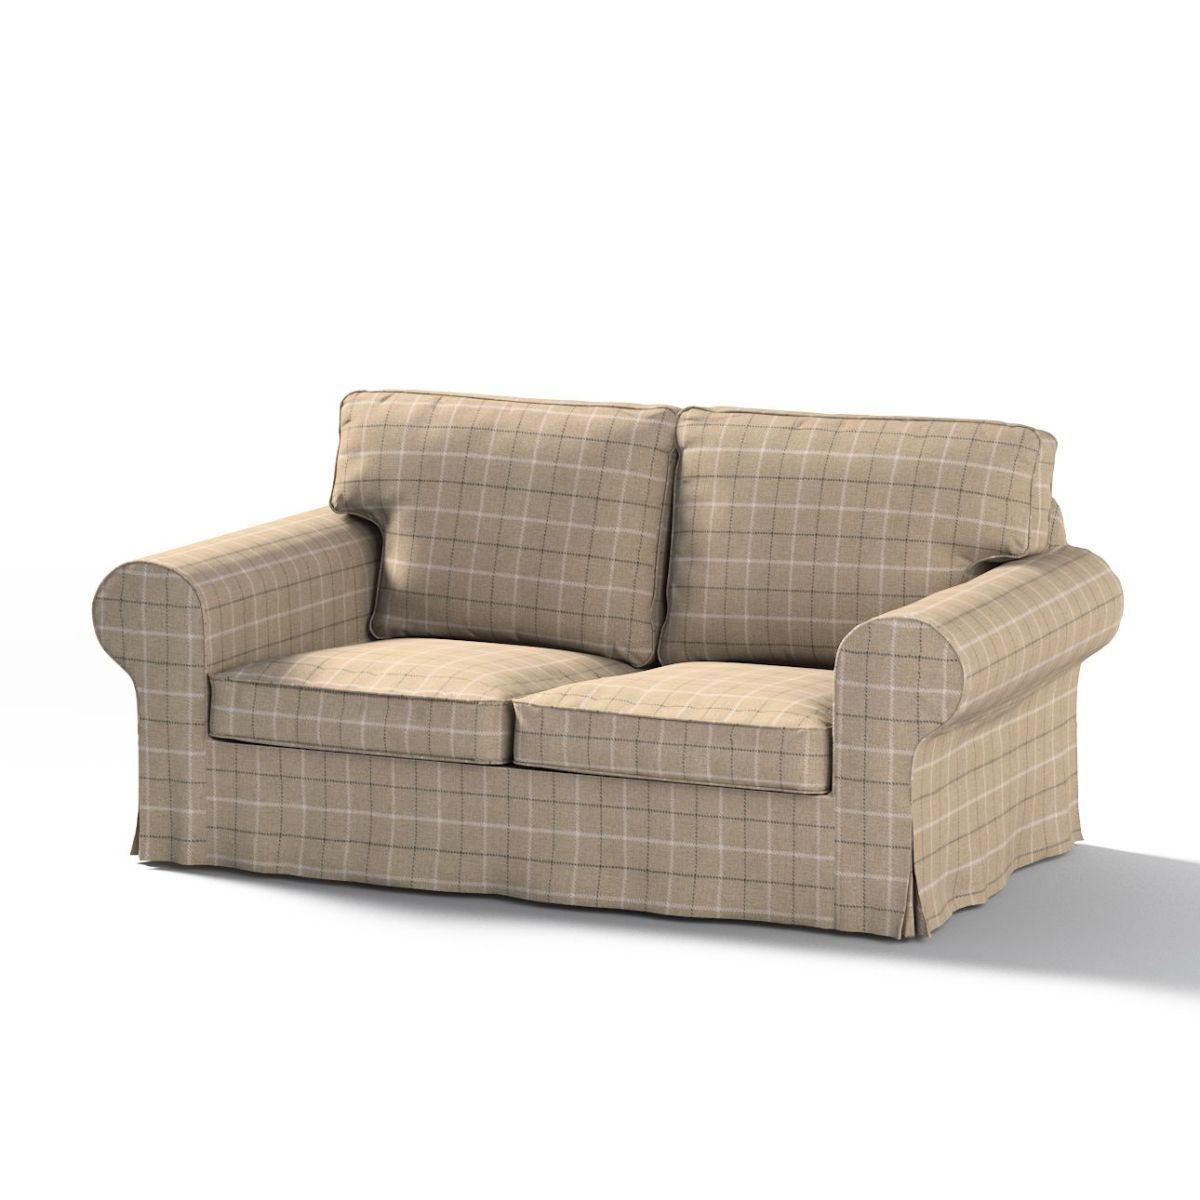 Ektorp 2 Sitzer Schlafsofabezug Neues Modell Grau Beige Sofabezug Fur Ektorp 2 Sitzer Ausklappbar Neues Modell Edinbu Wohnzimmer Sofa Mobel Sofa Schlafsofa